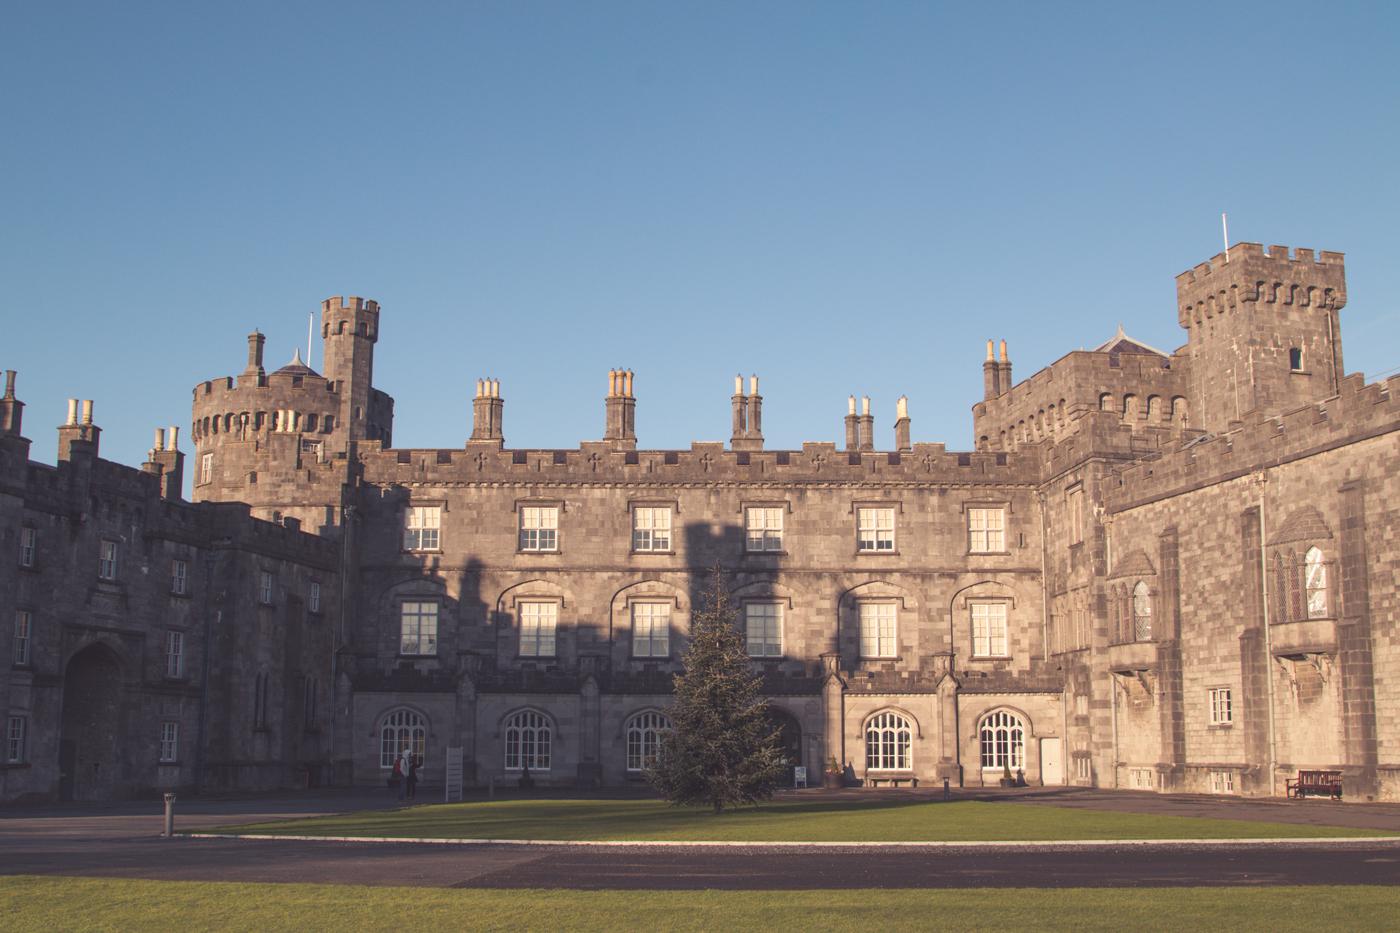 Morning light on Kilkenny Castle